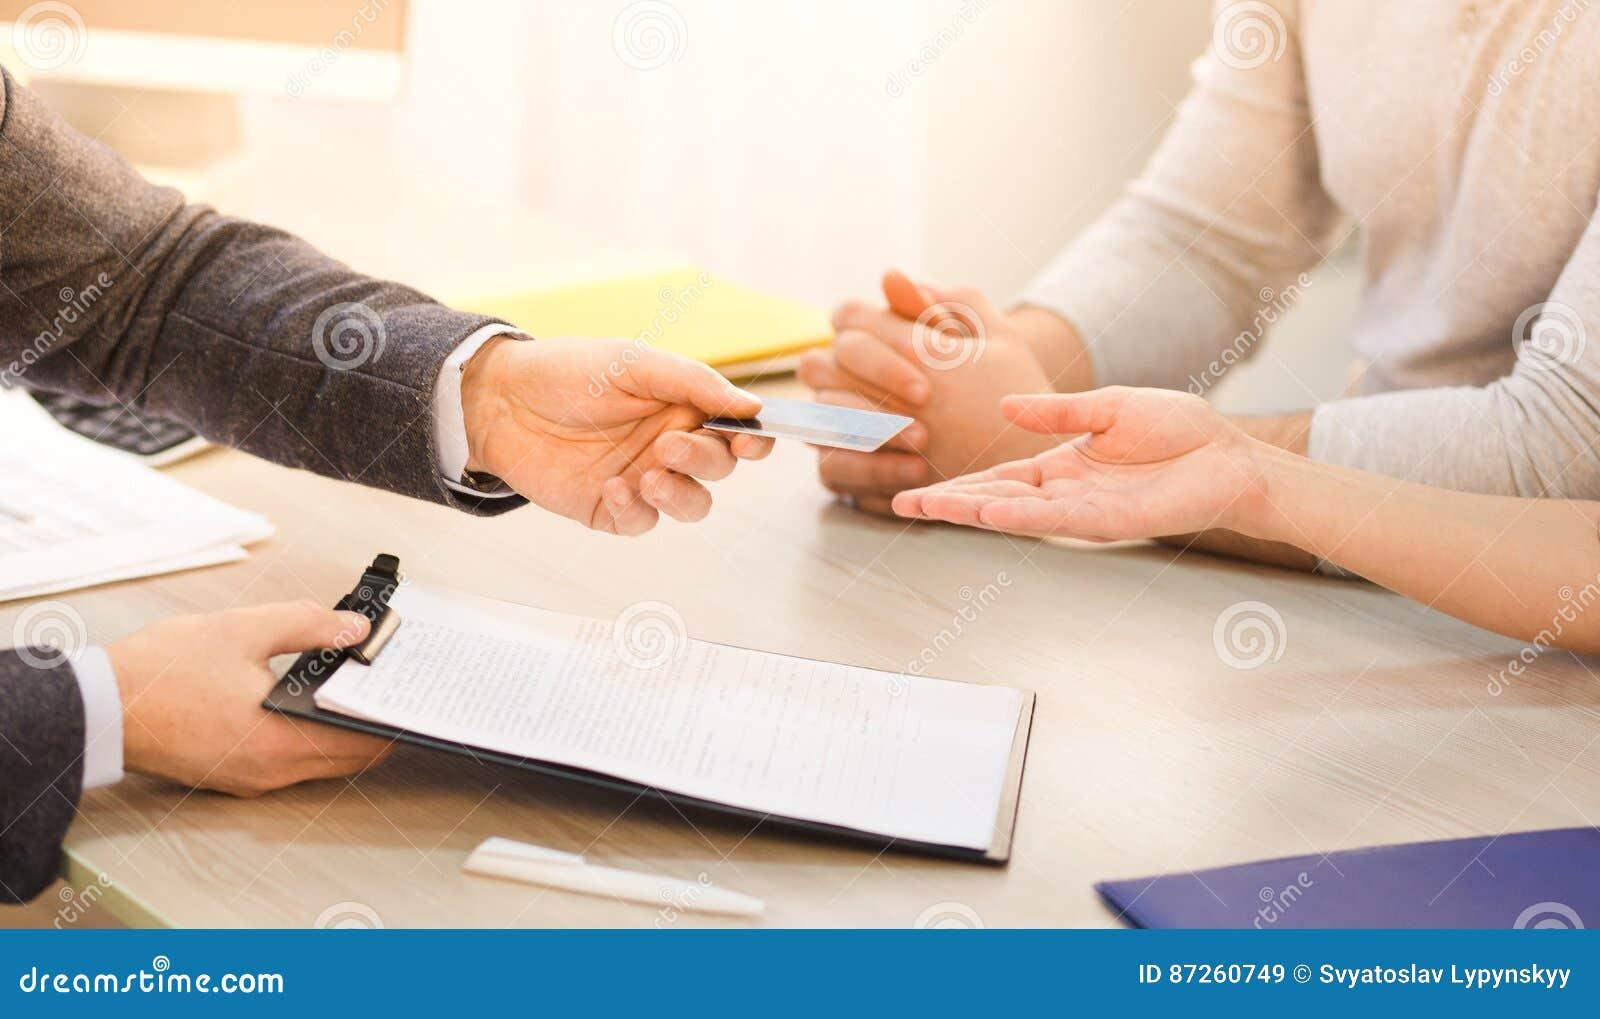 Salesman giving credit card